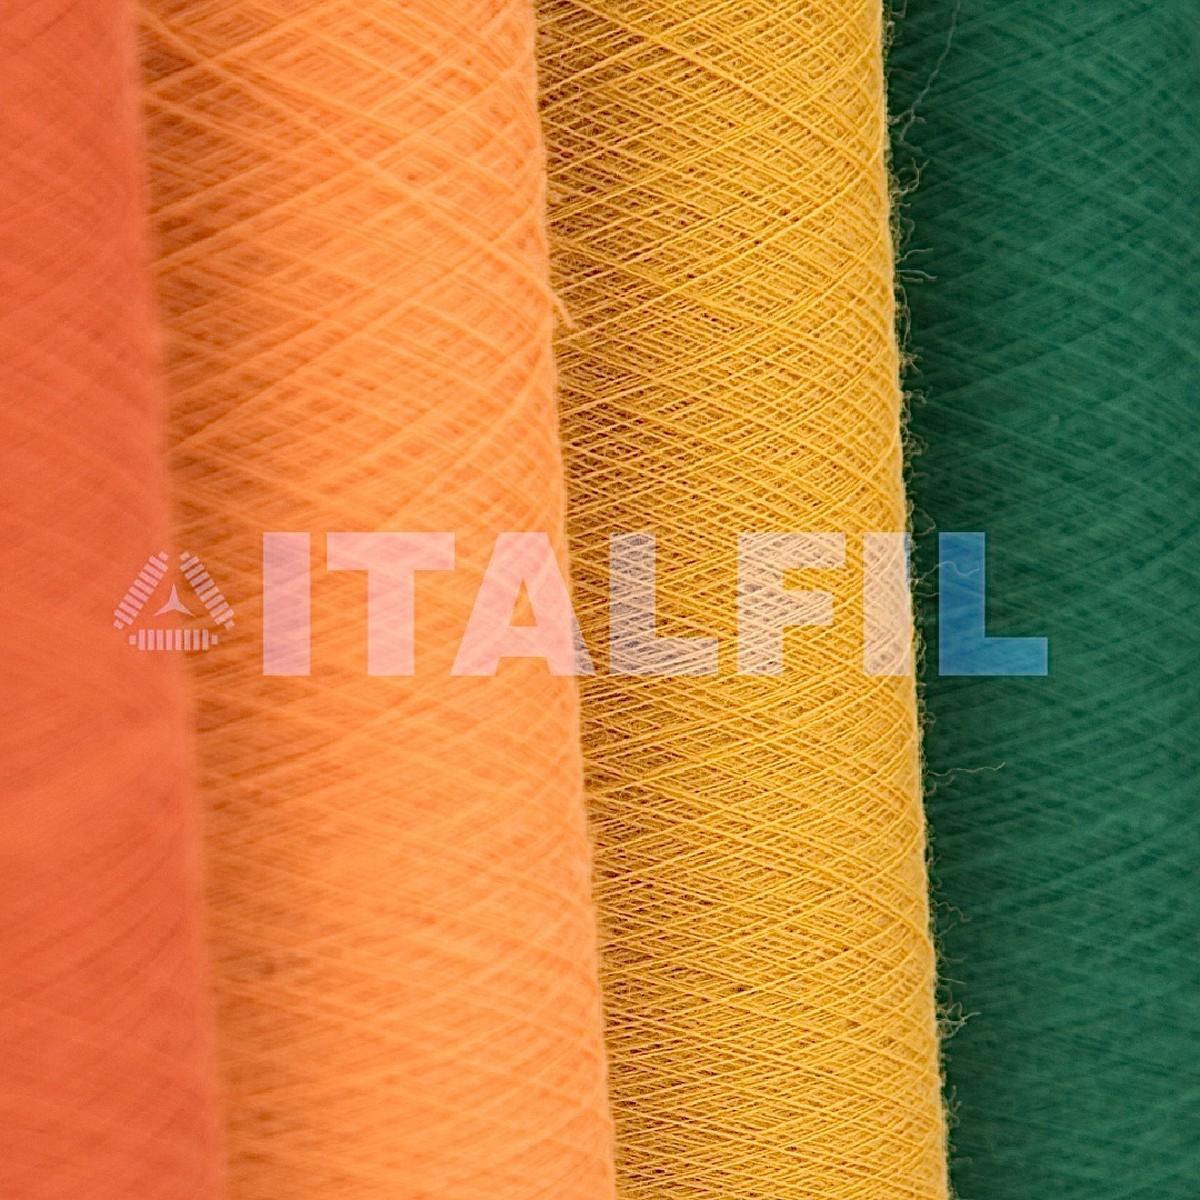 Italfil: Innovation And Sustainability